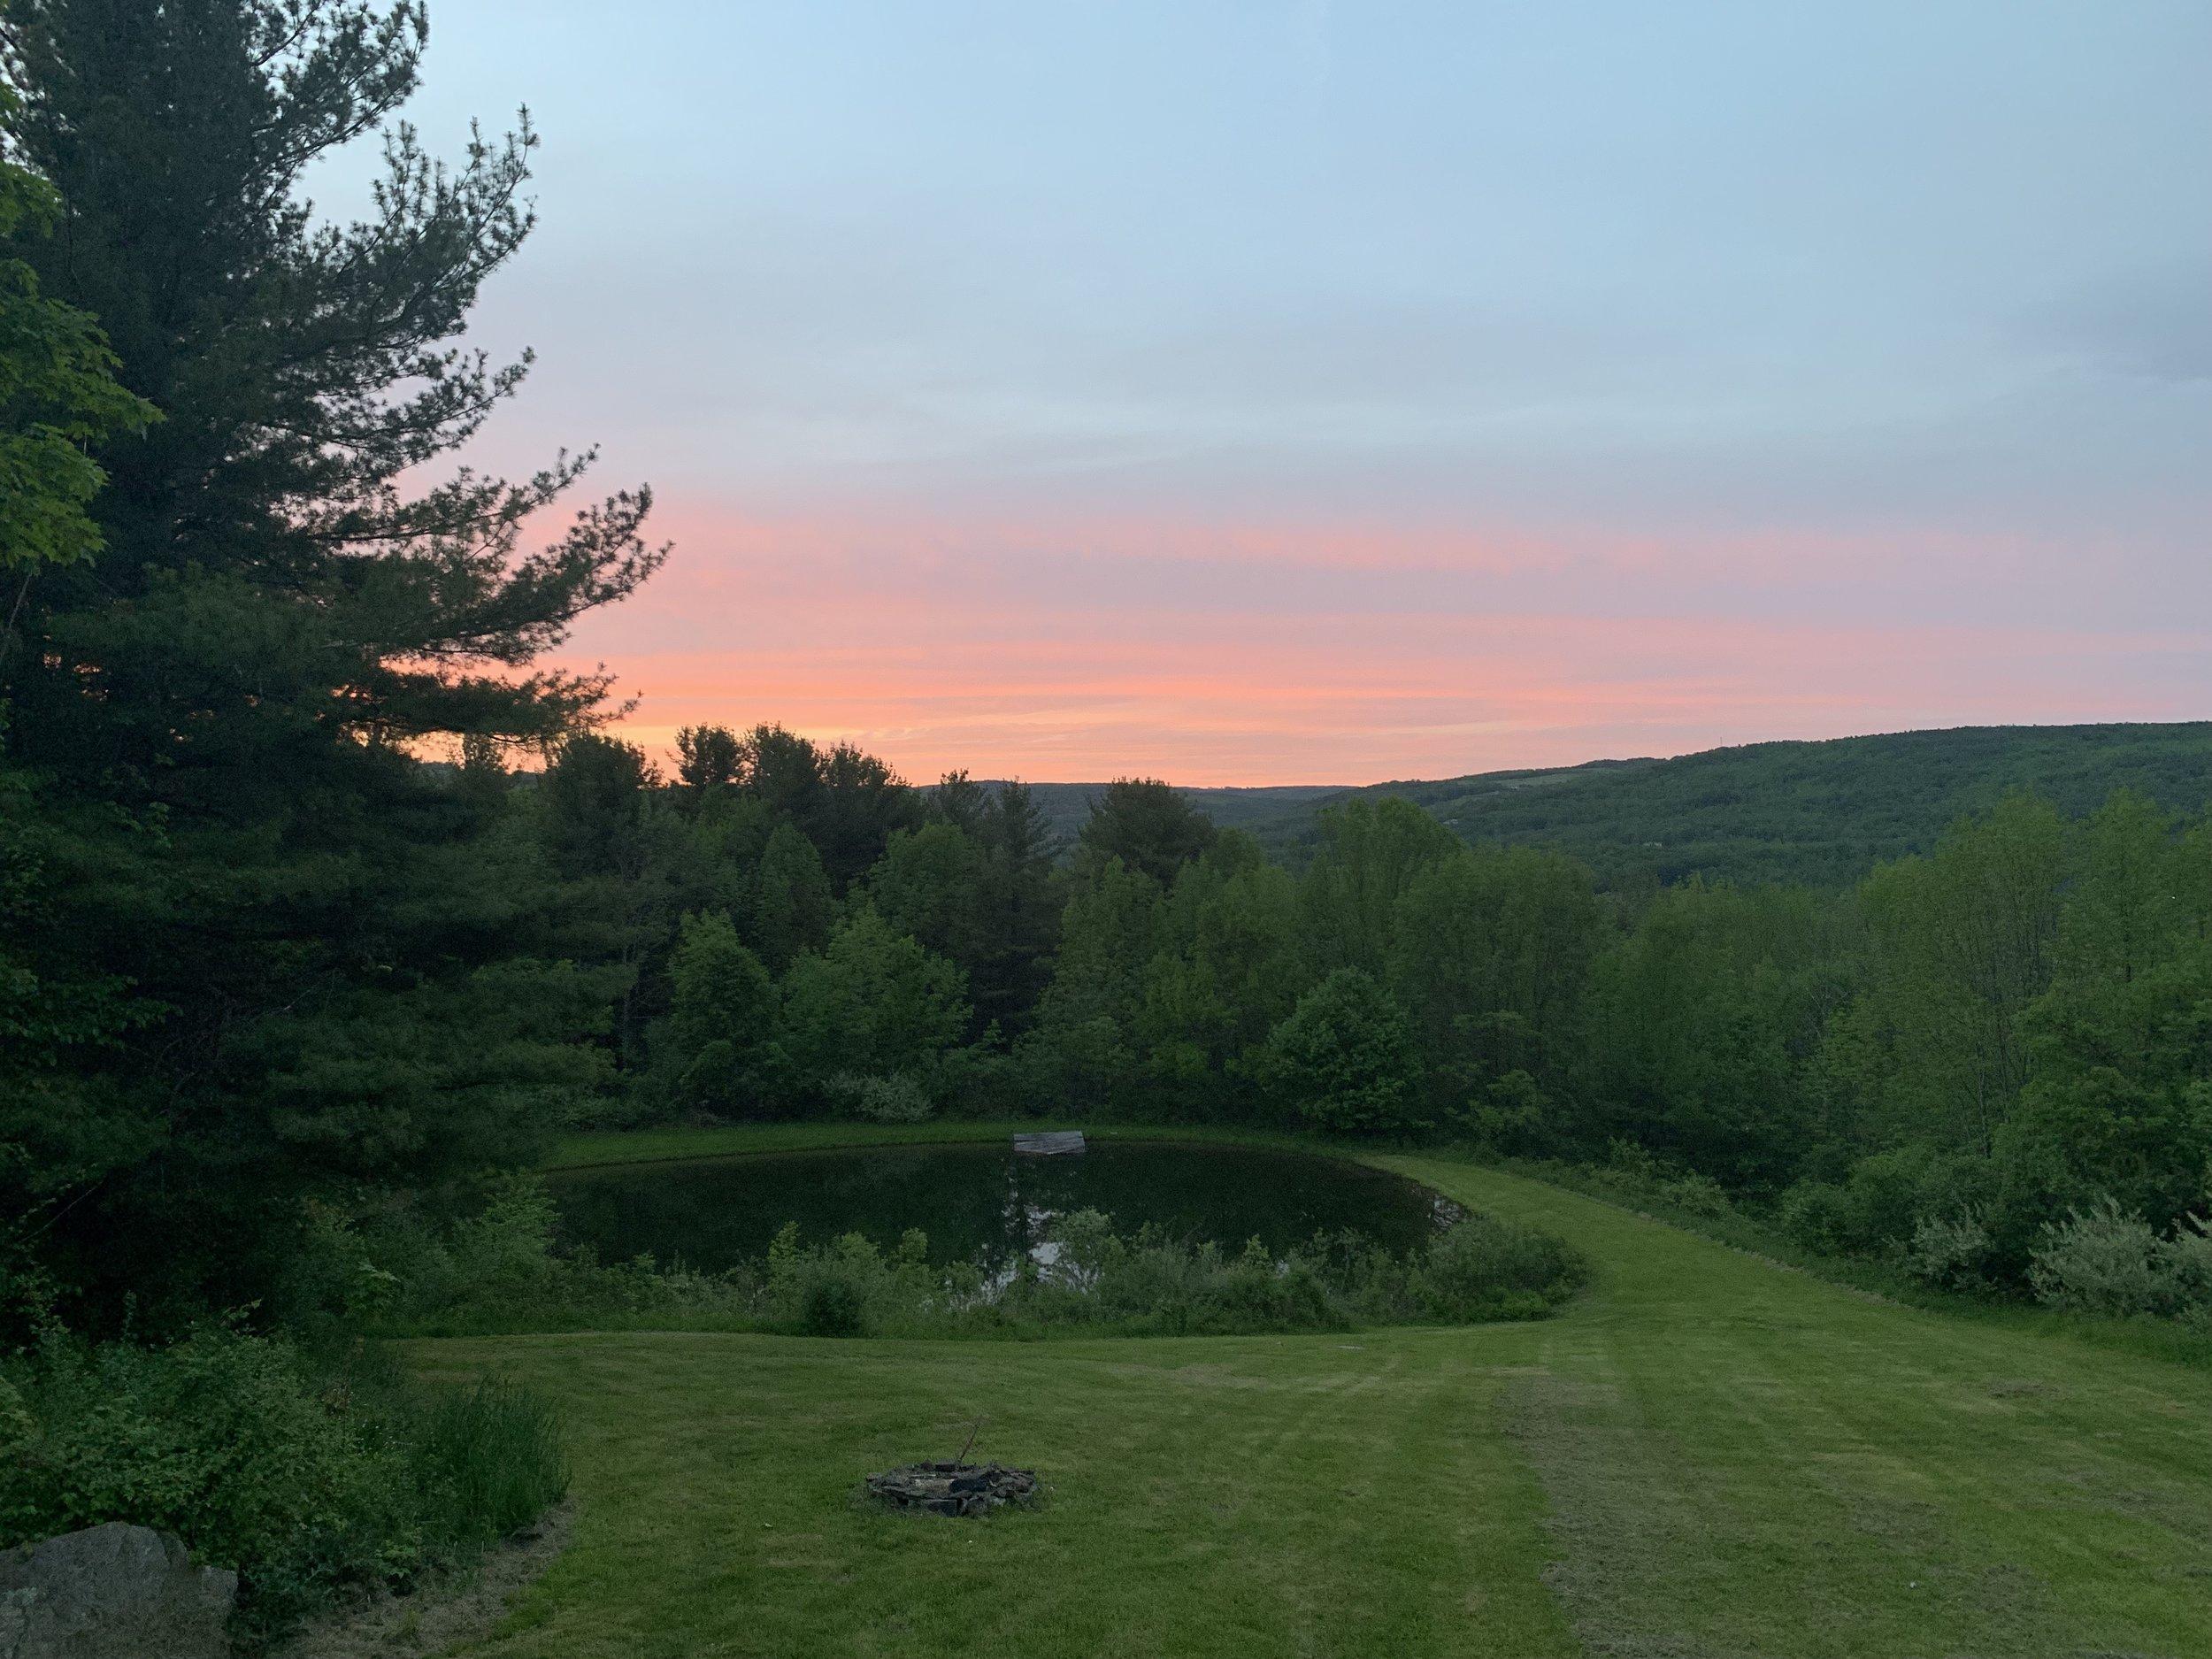 Catskills sunset